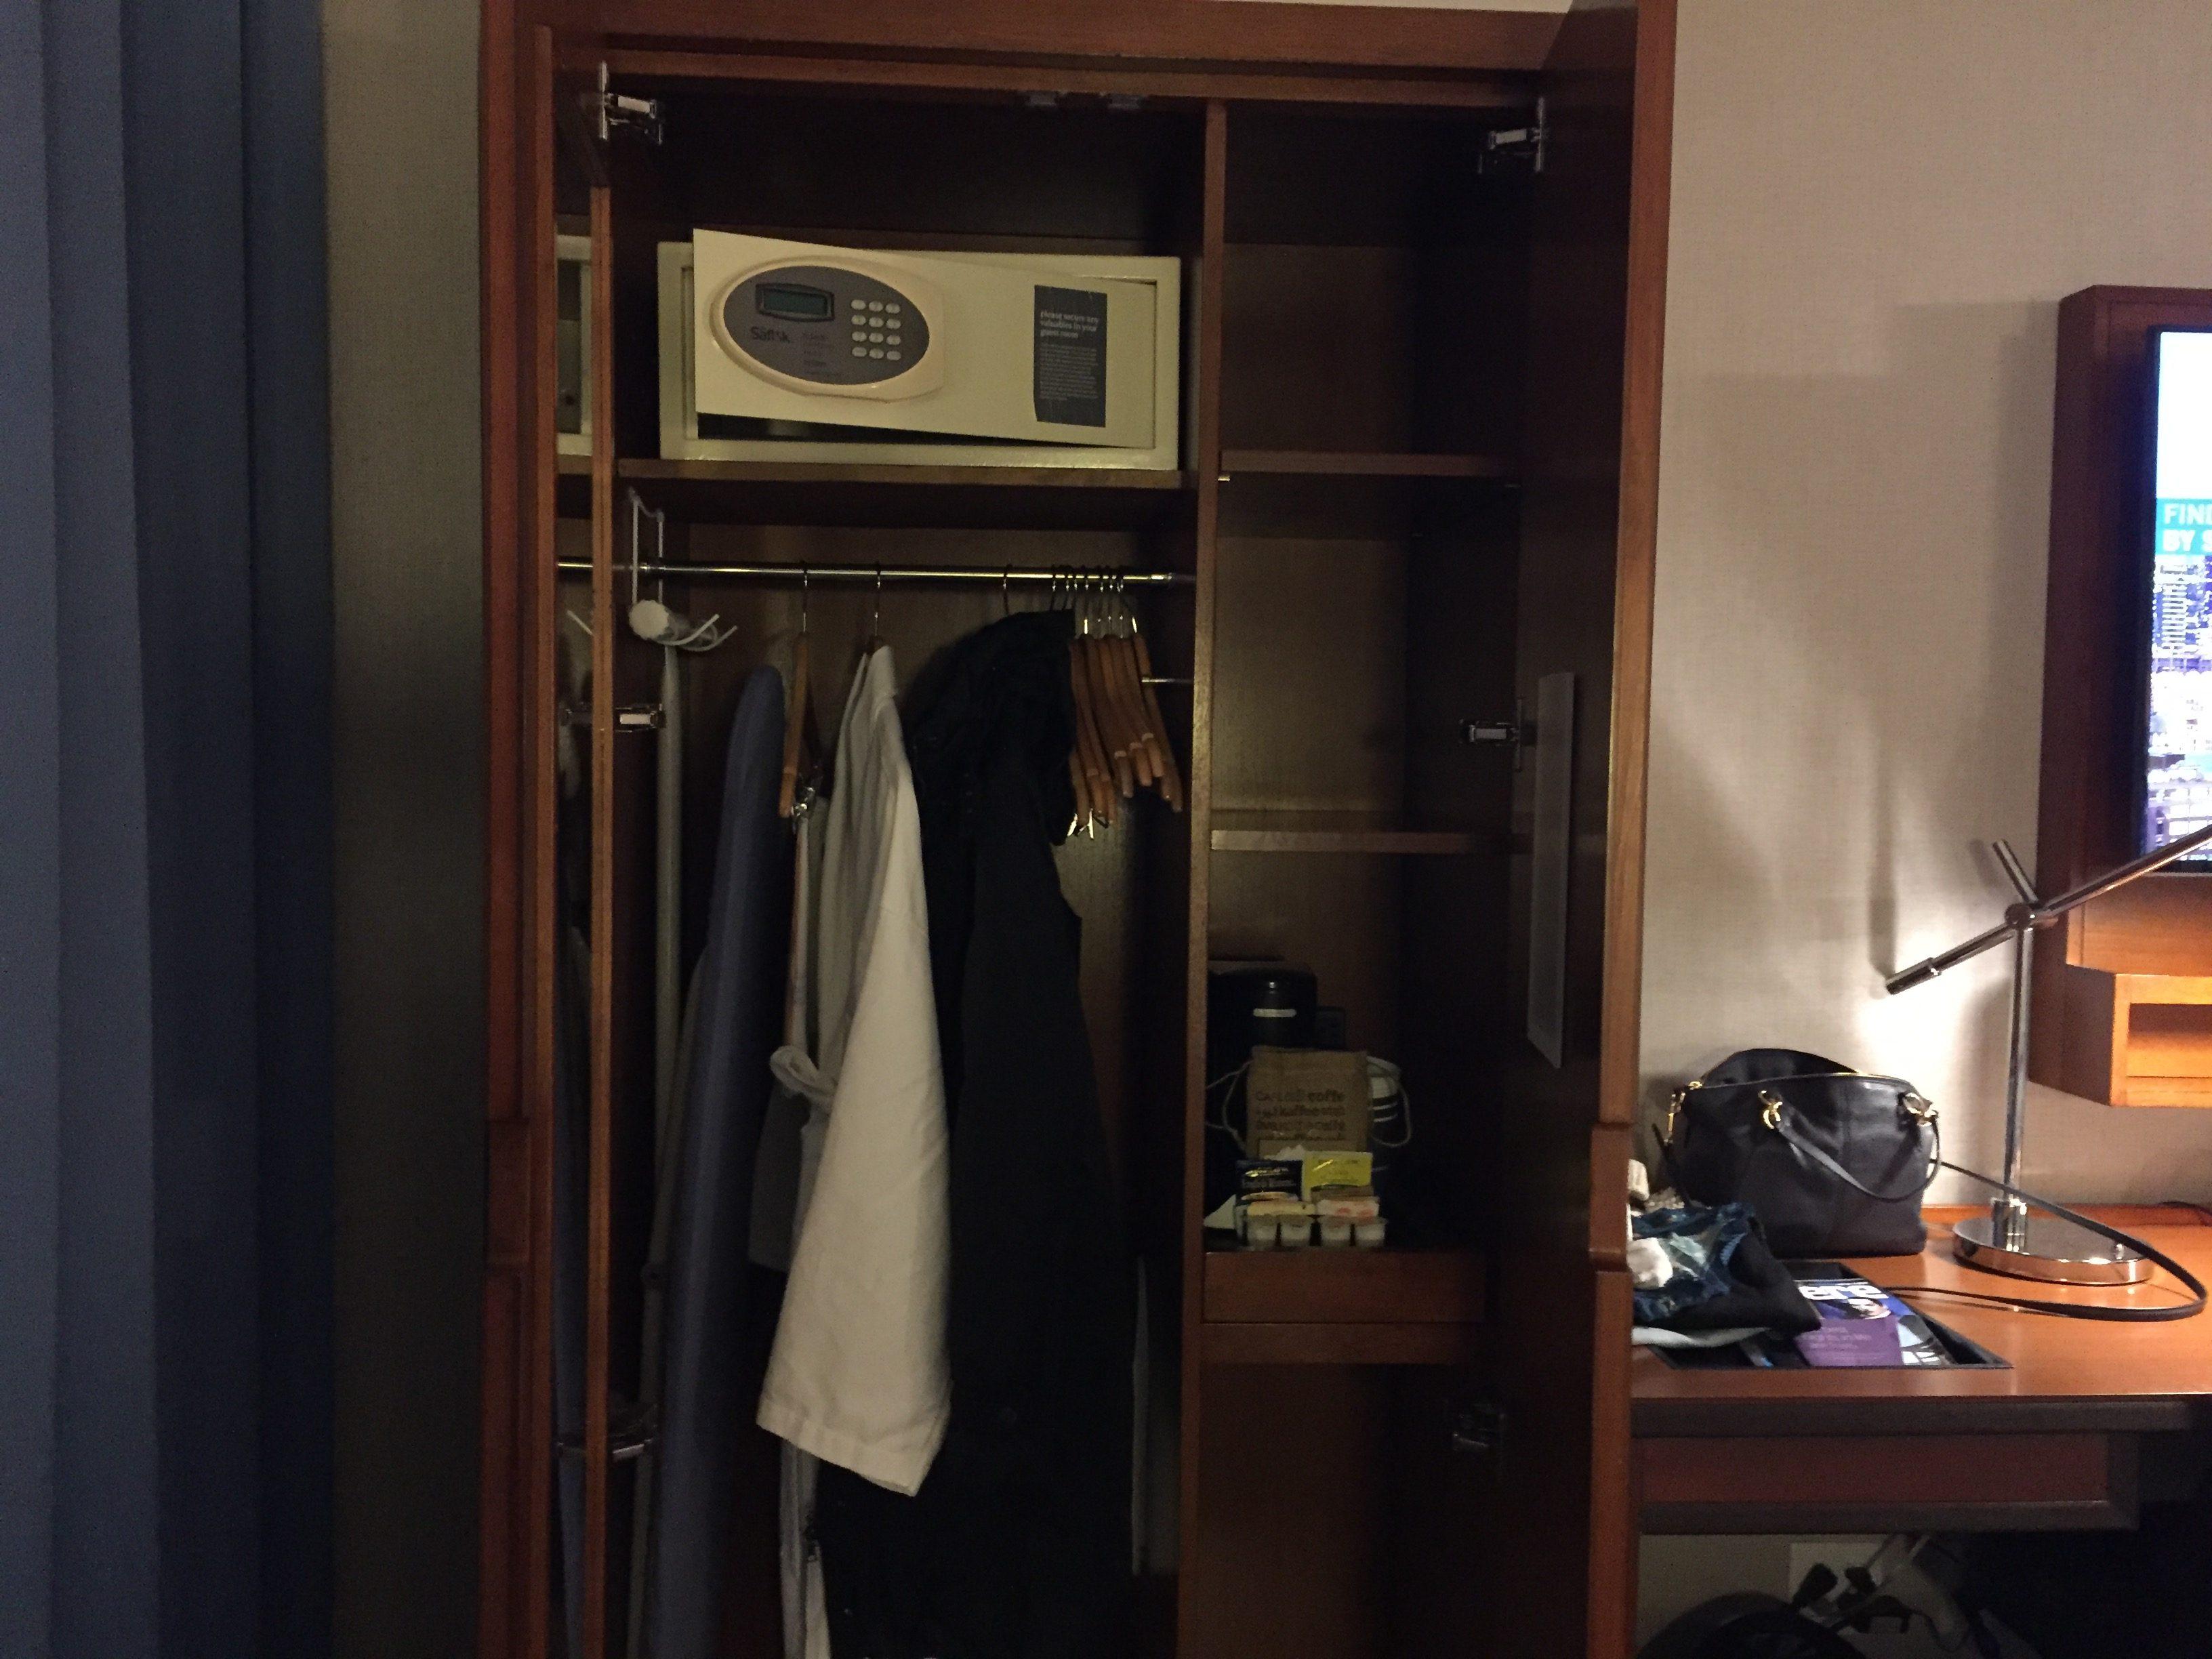 IMG 35471 e1517837682109 - El Hotel Four Points by Sheraton en Manhattan New York